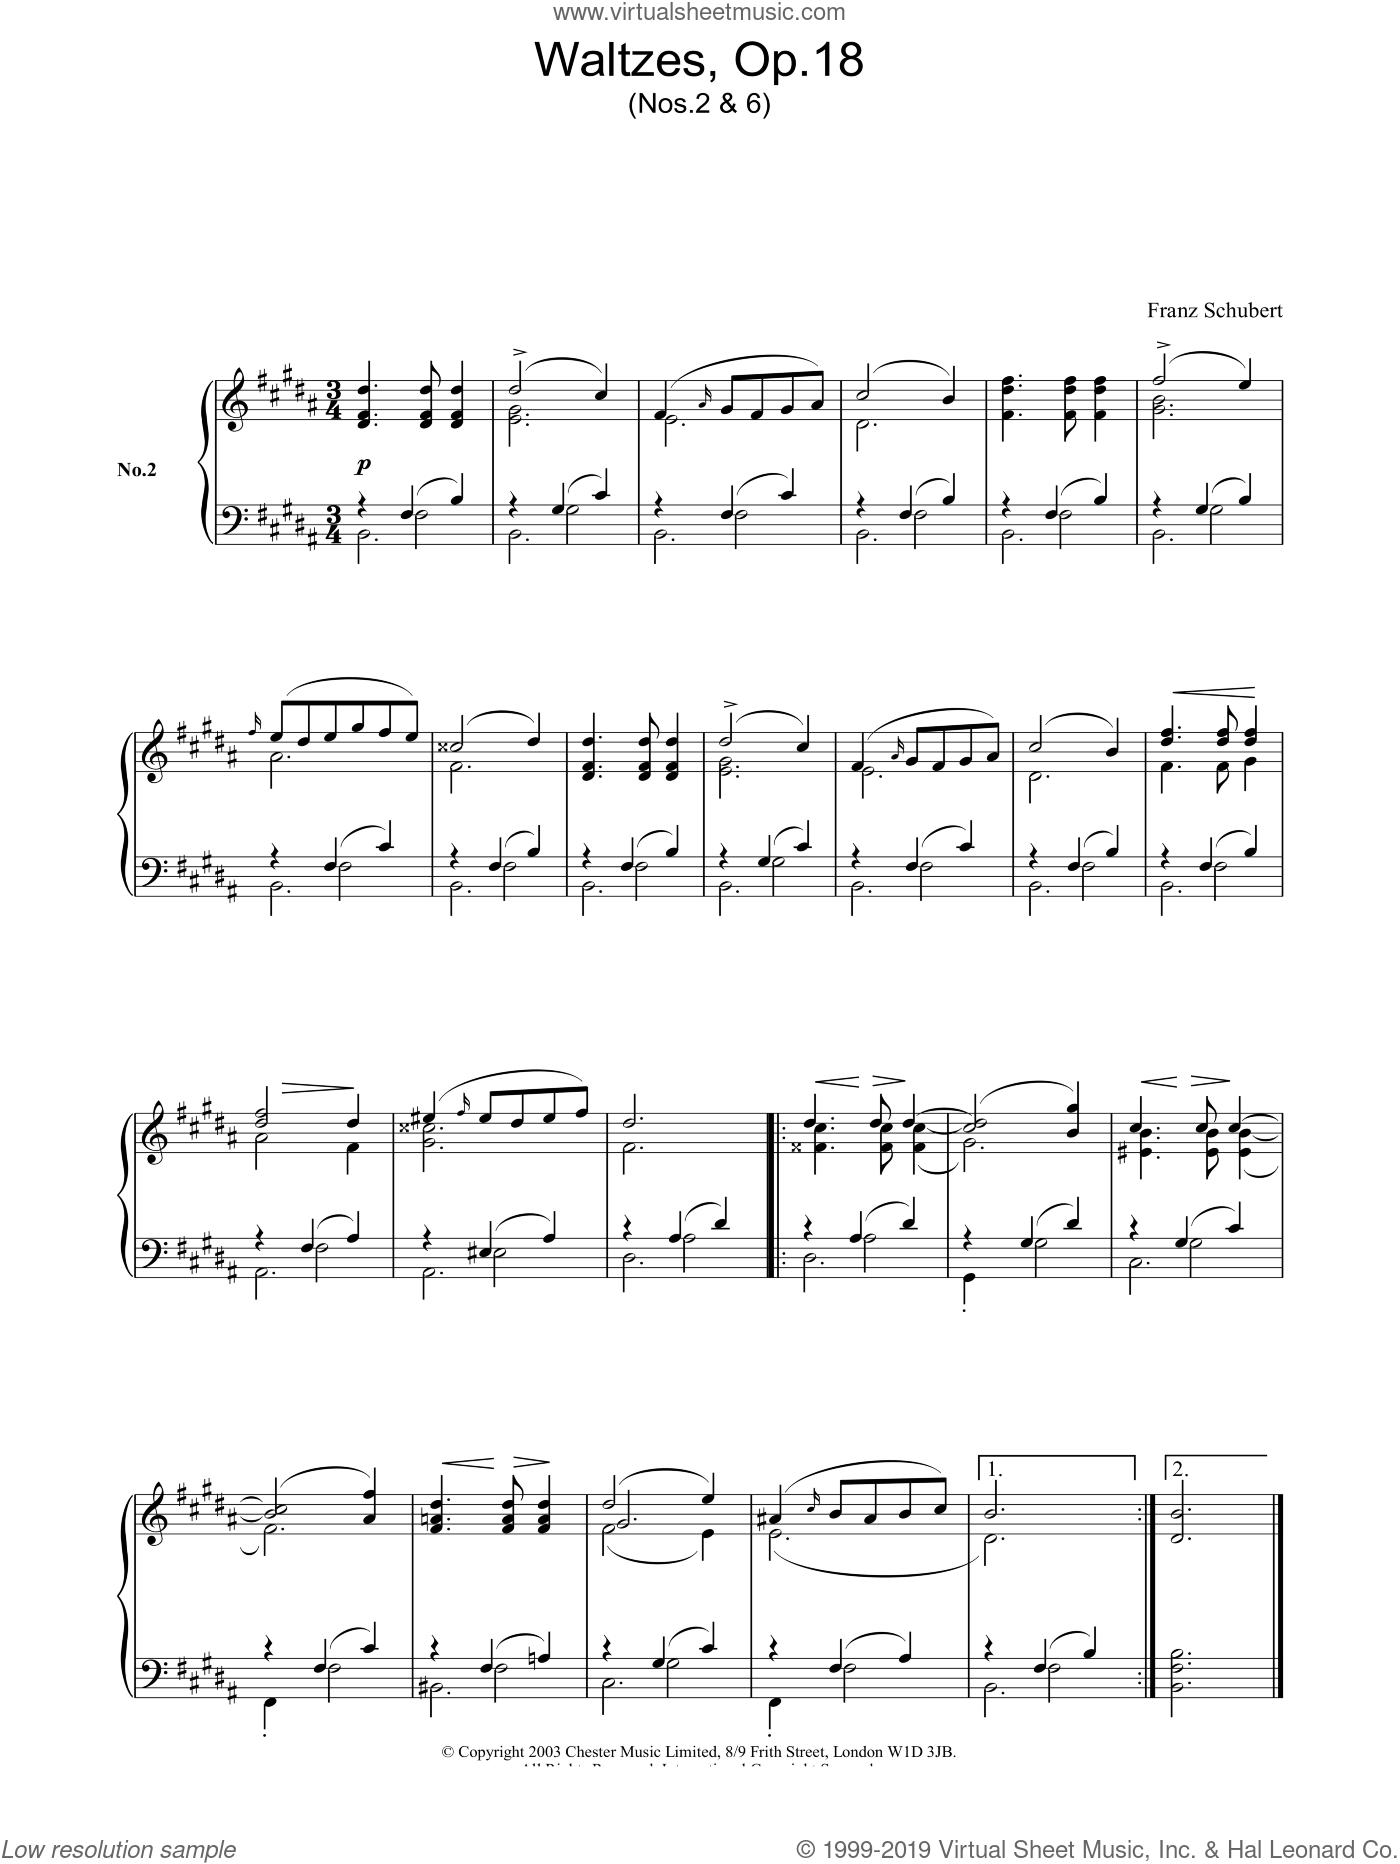 Waltzes, Op.18 sheet music for piano solo by Franz Schubert, classical score, intermediate skill level